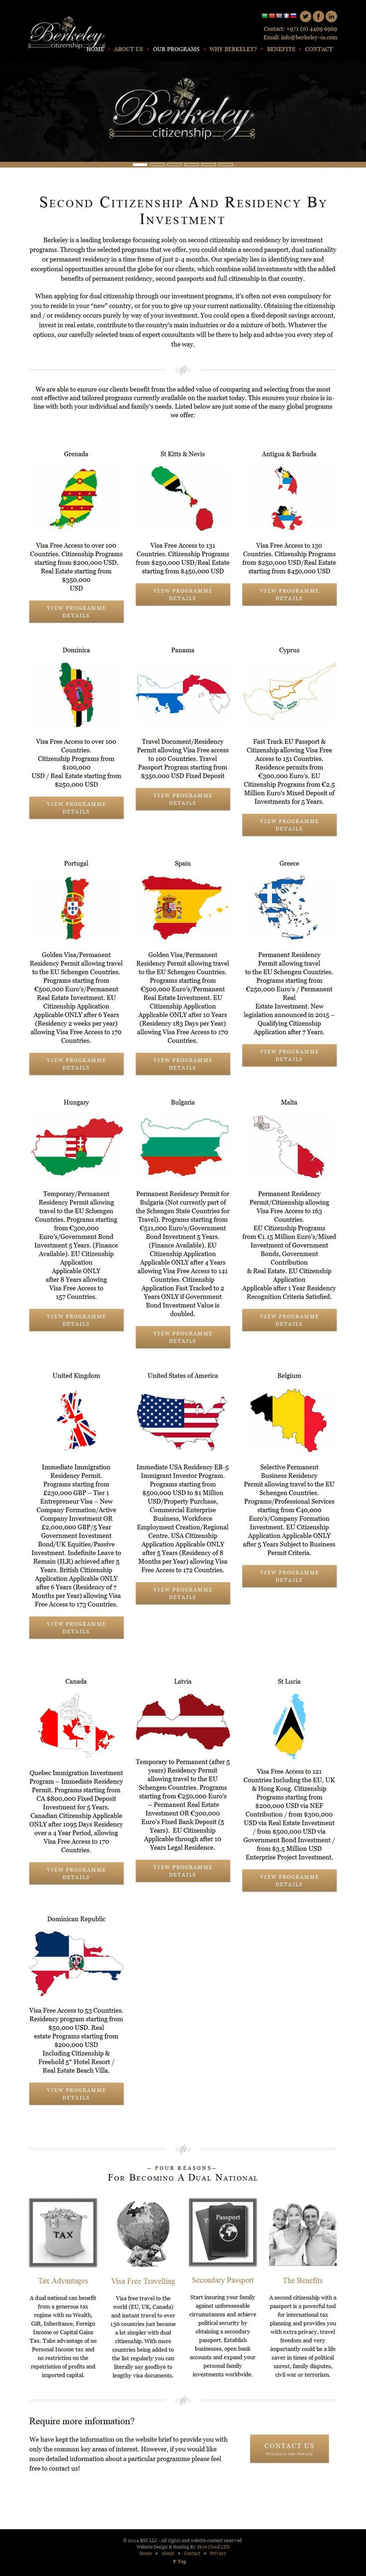 Berkeley Citizenship Consultancy Company Sidra Tower, 21, Al Noor Street 10 Floor, Office 1005 Al Sufouh 1 - 372, Jumeirah, Dubai | www.HaiUAE.com is a complete Travel Guide to Dubai, Ajman, Alain, Abu Dhabi, Fujairah, Sharjah, Ras al khaimah, Umm Al Quwain, United Arab Emirates, GCC Countries. Explore more about Dubai Yellow Pages, Building Contractors in Dubai, Yellow Pages UAE, ARAMEX, Construction Companies in UAE